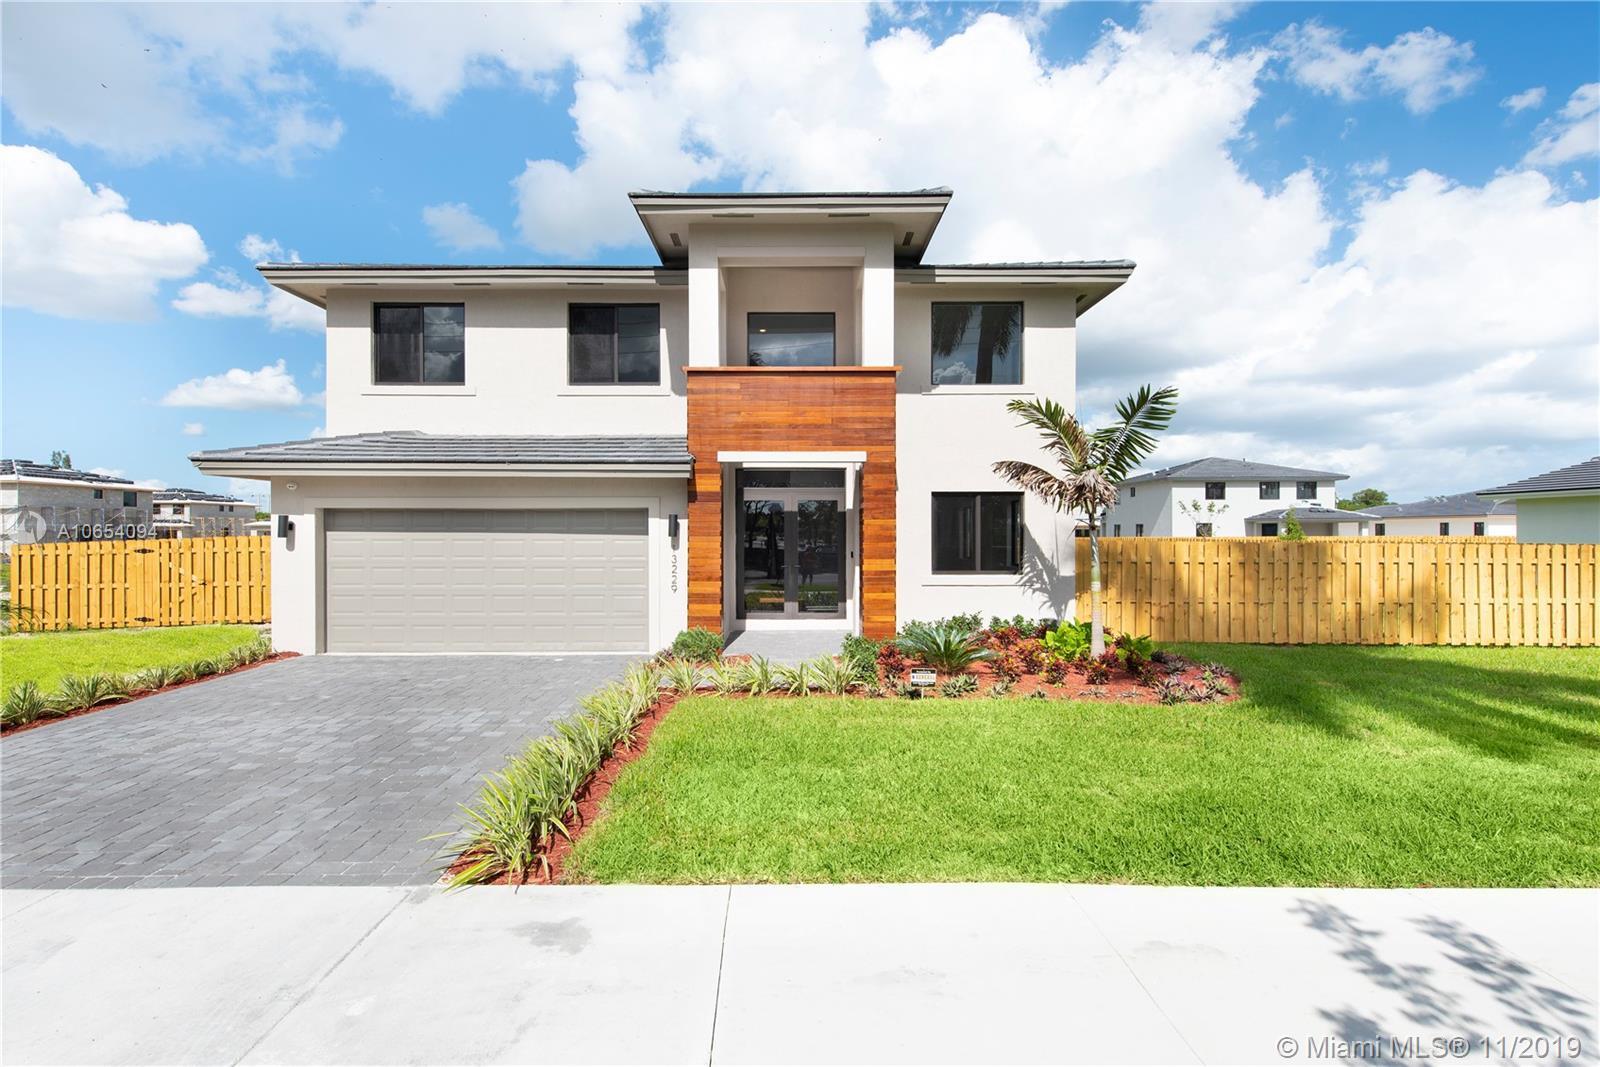 13229 SW 232 St, Homestead, FL 33170 - Homestead, FL real estate listing